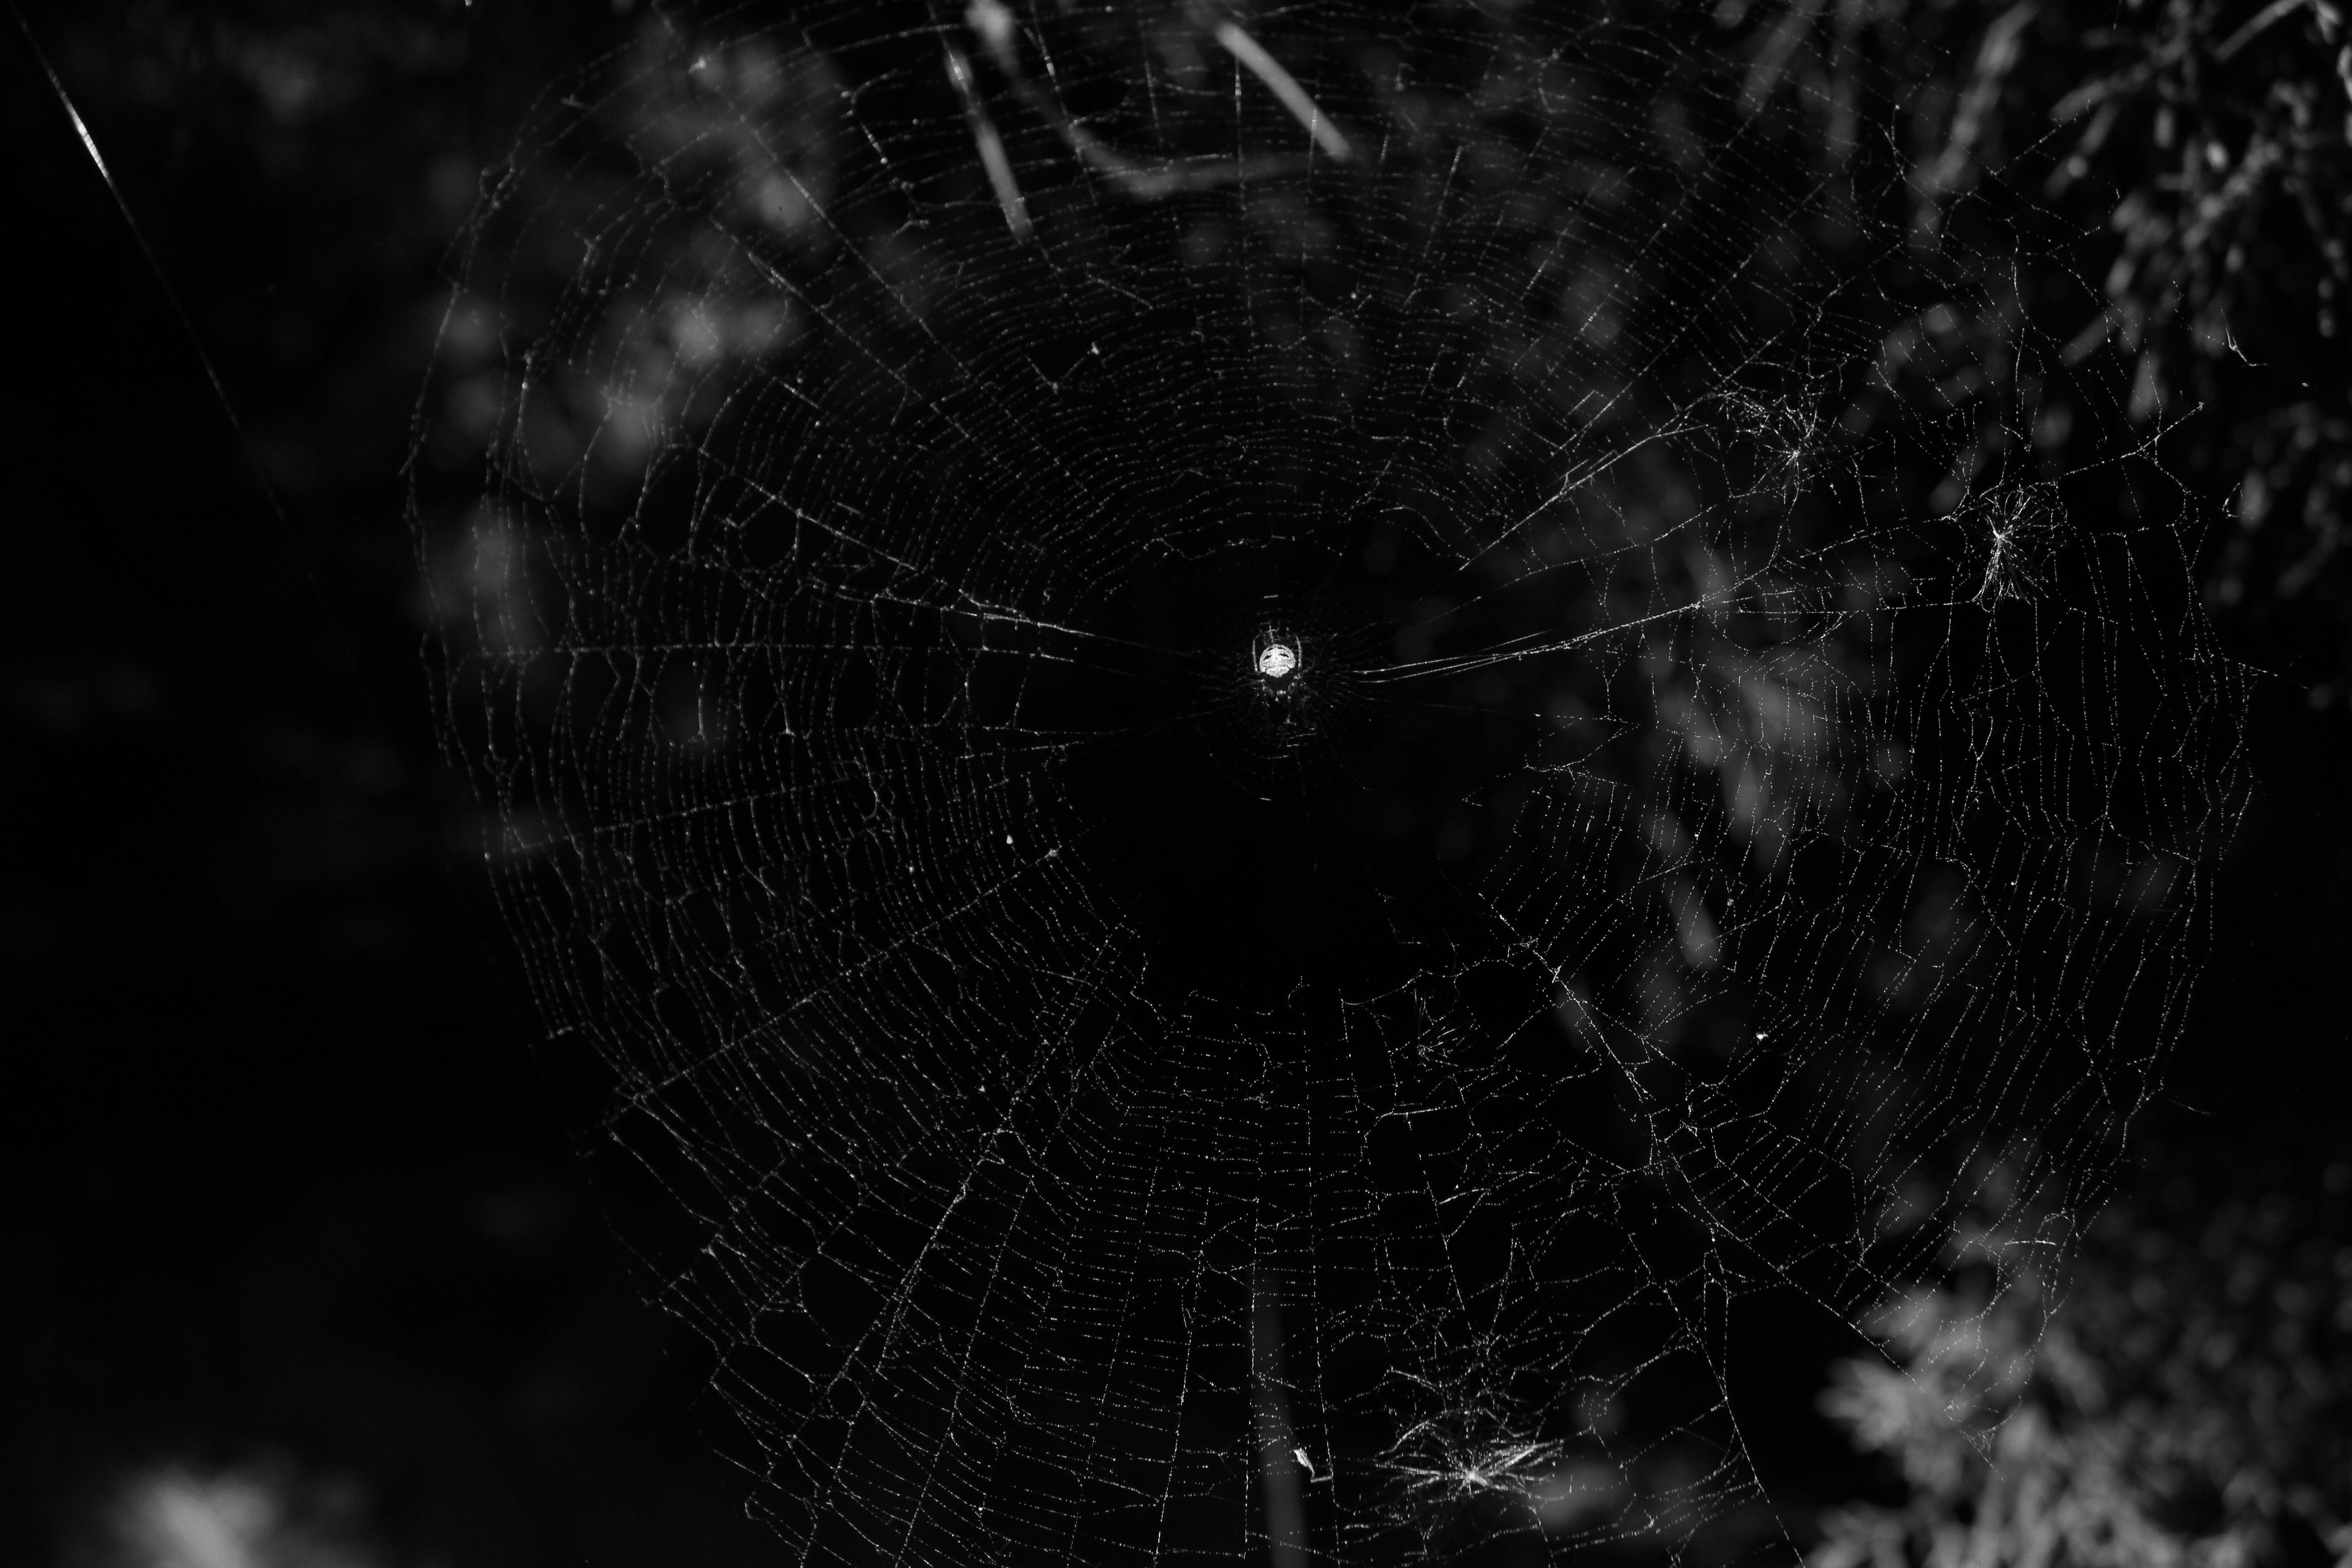 Free stock photo of abstract photo, cobweb, dark blue, dark side